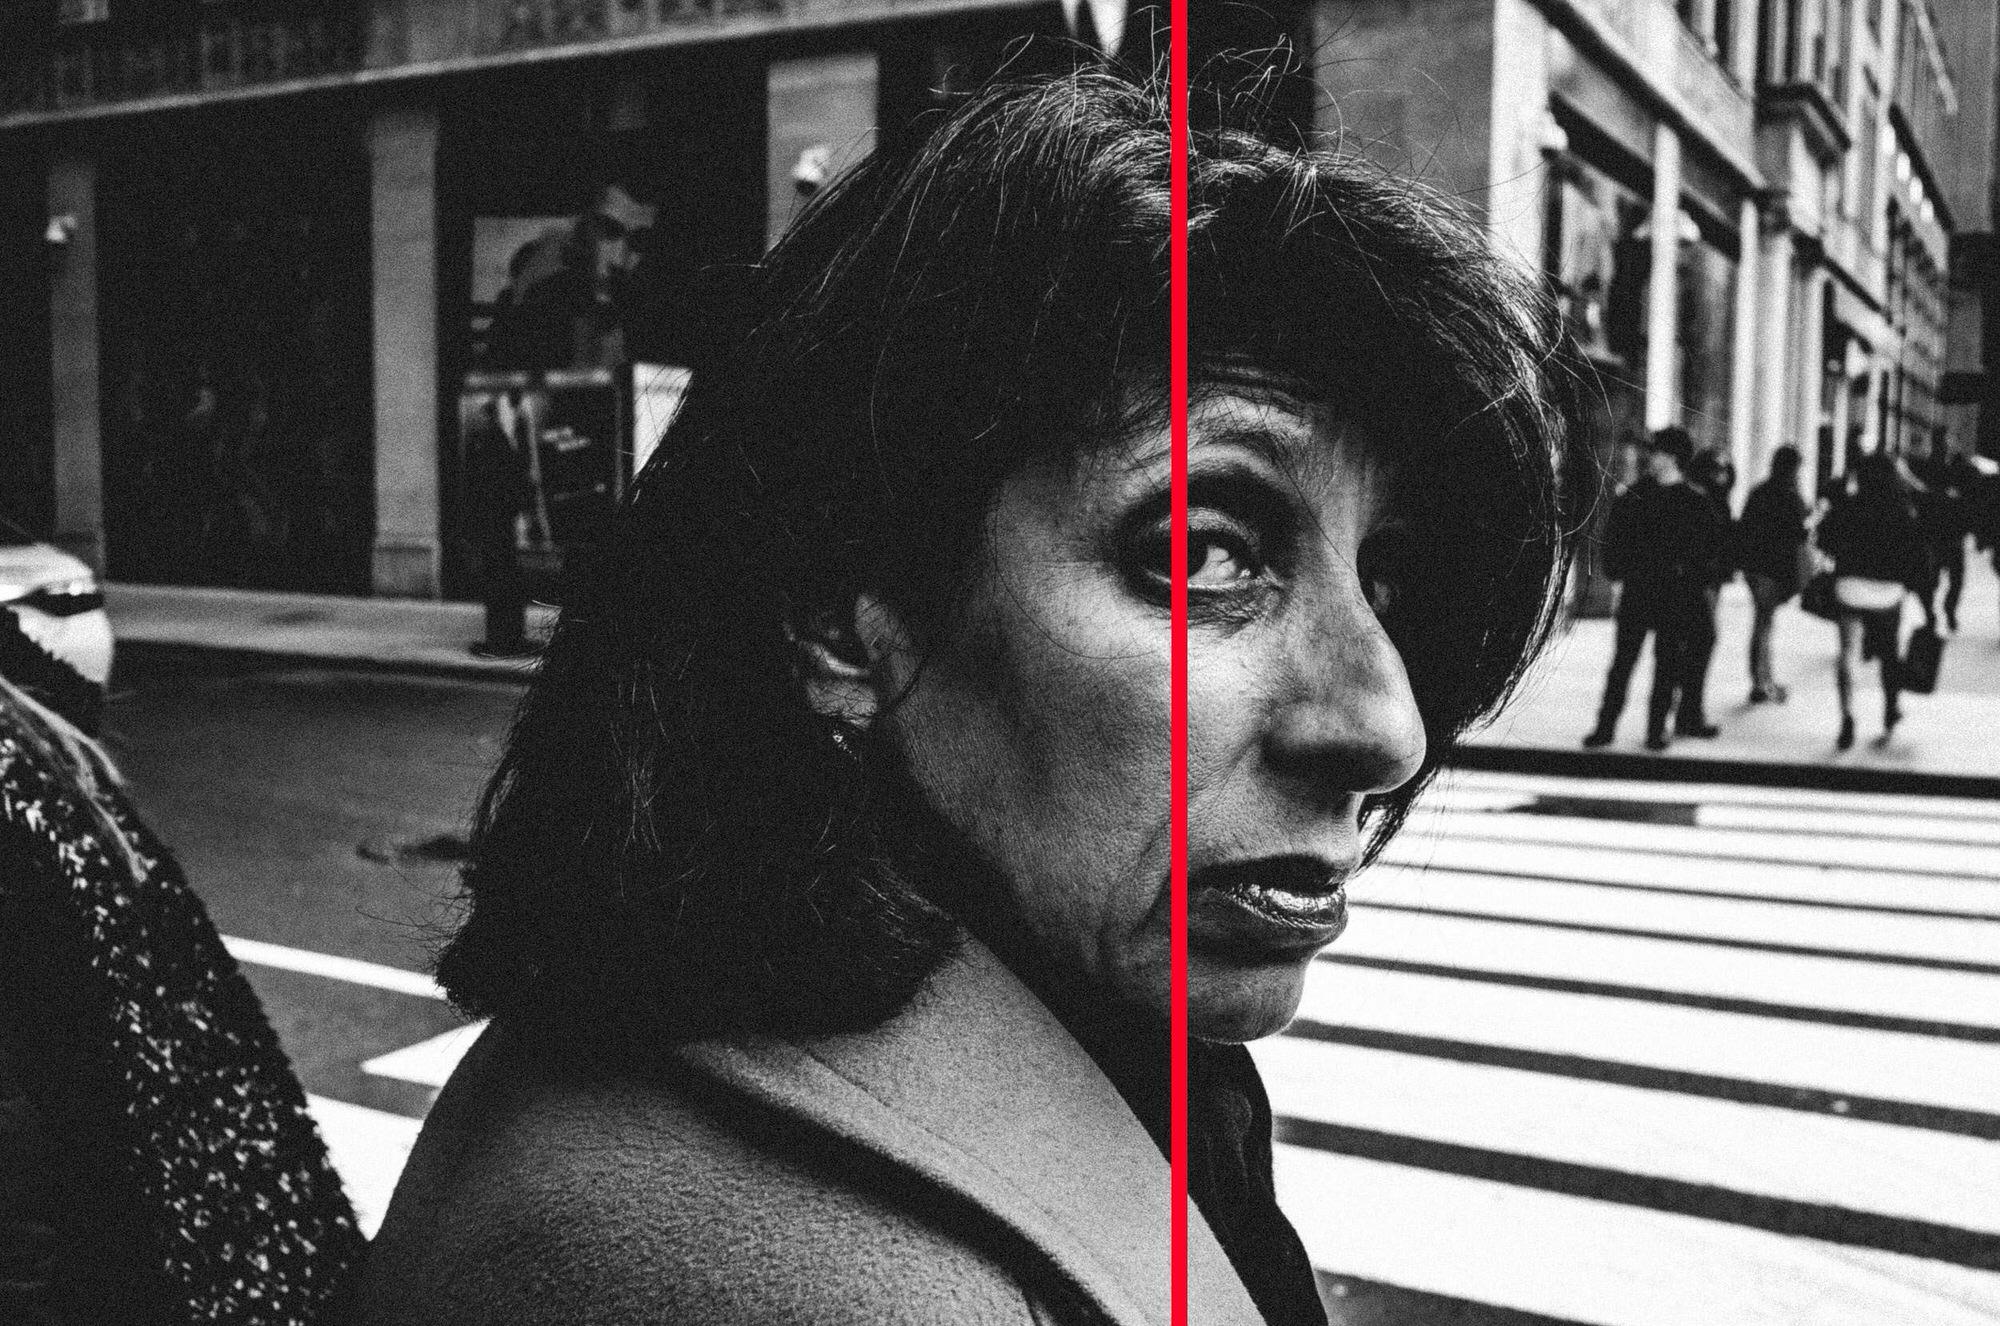 eric kim center eye nyc street photography2